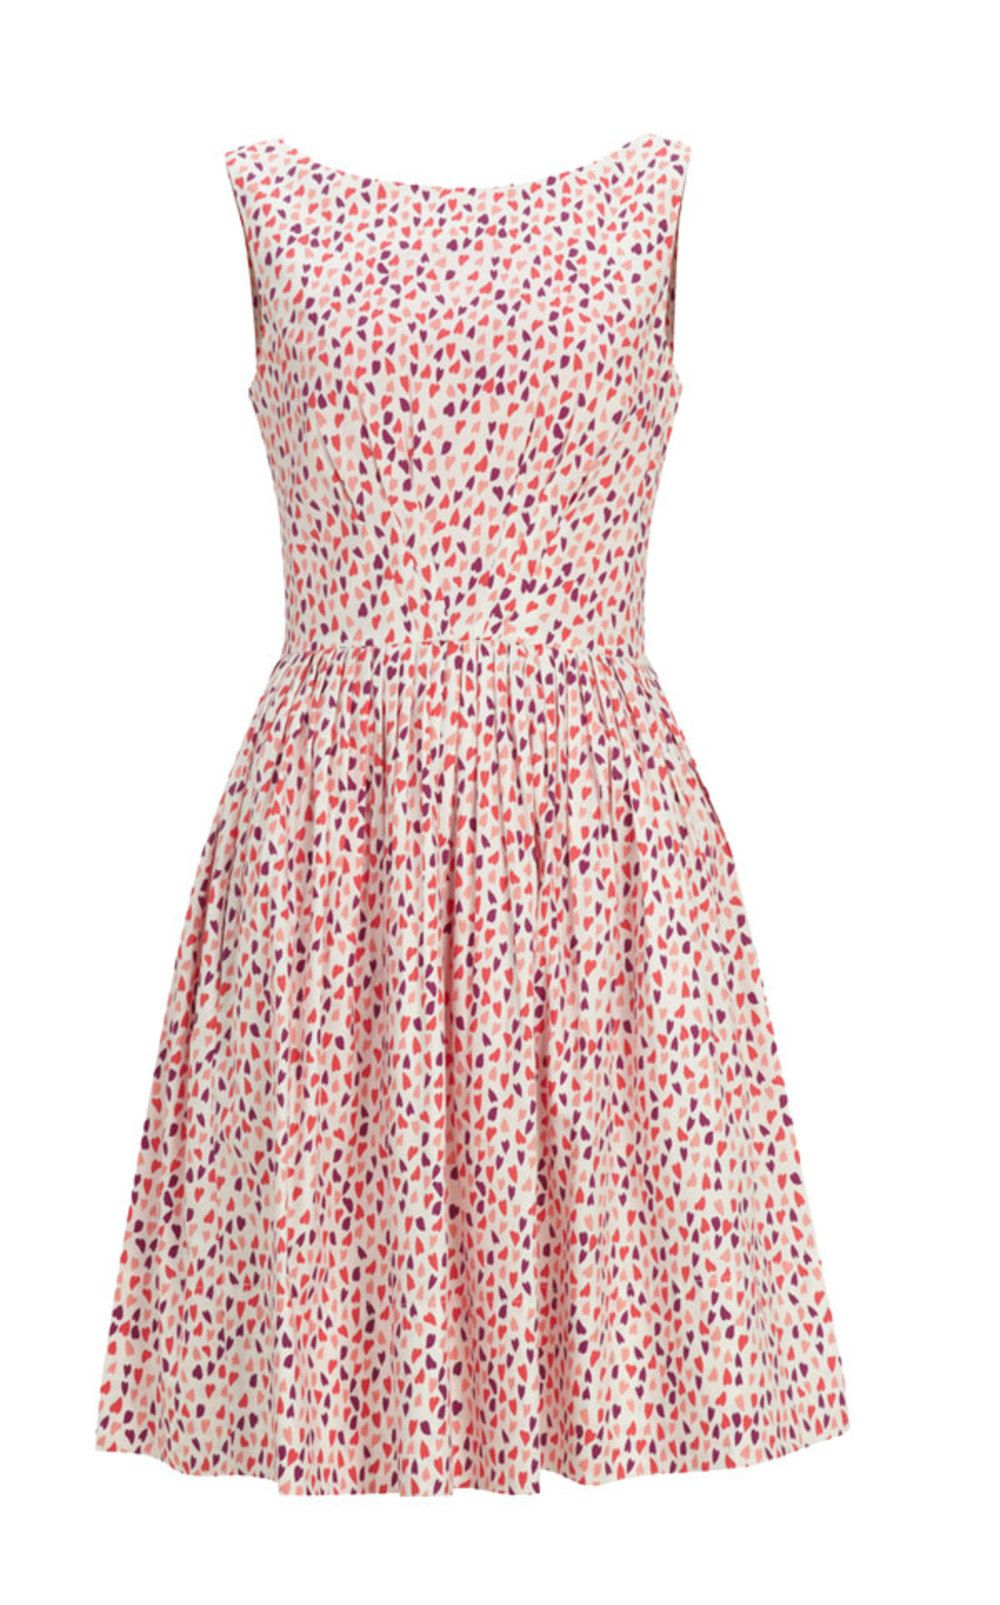 Emily and Fin - Abigail Dress in Heart Print #alittleshopnz | MODA ...